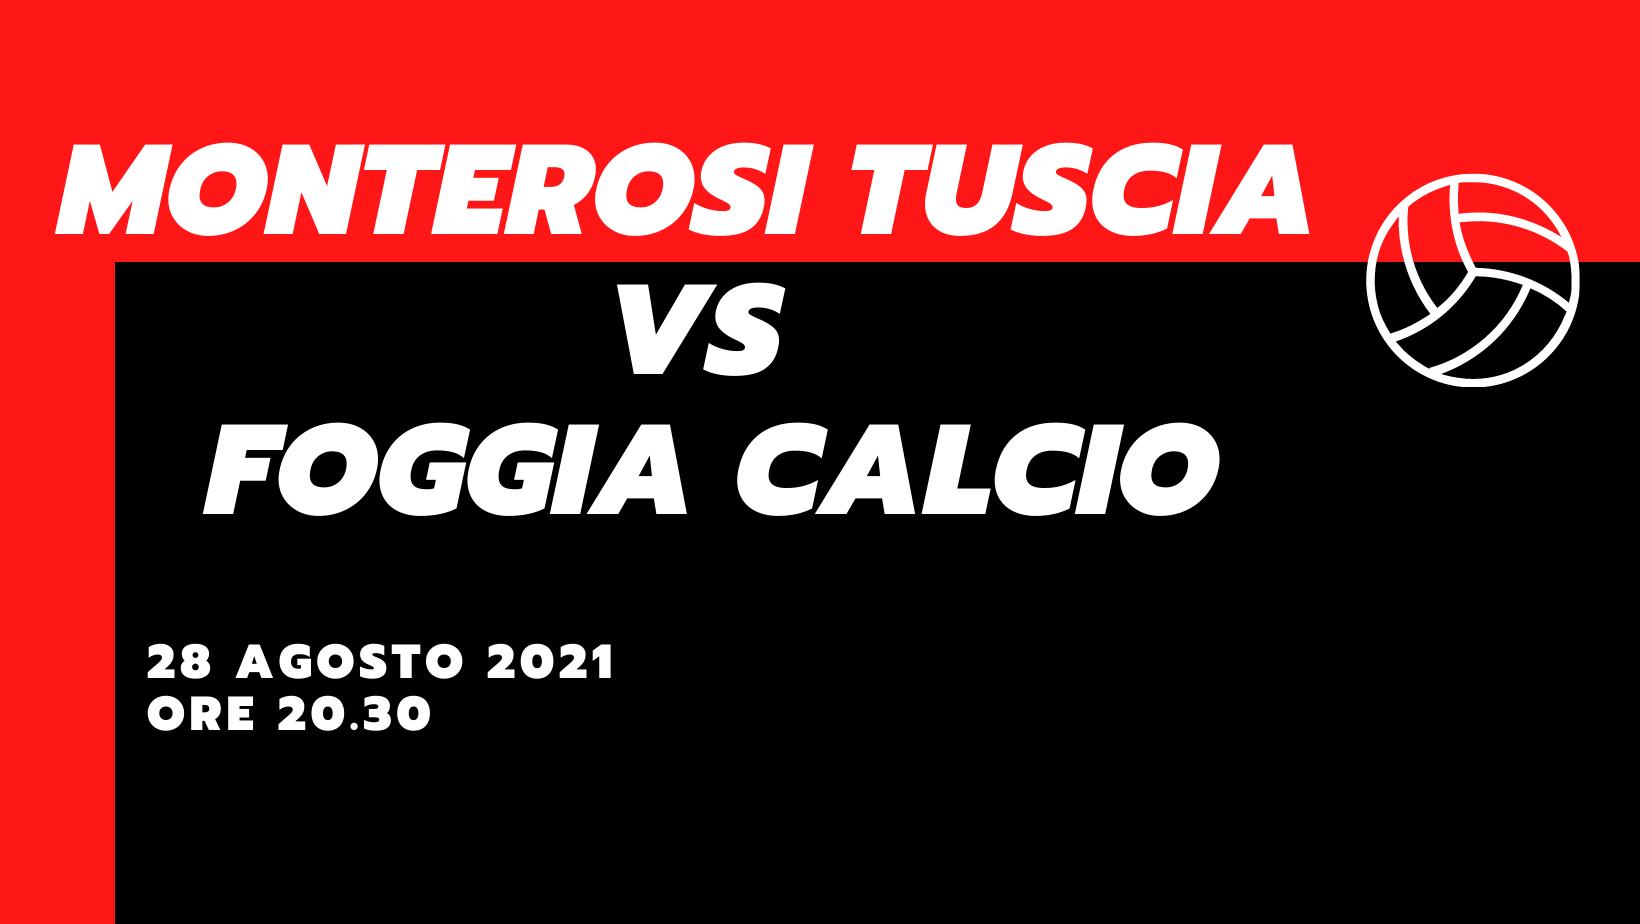 Monterosi Tuscia – Foggia Calcio Highlights Partita 28 agosto 2021 Serie C Girone C